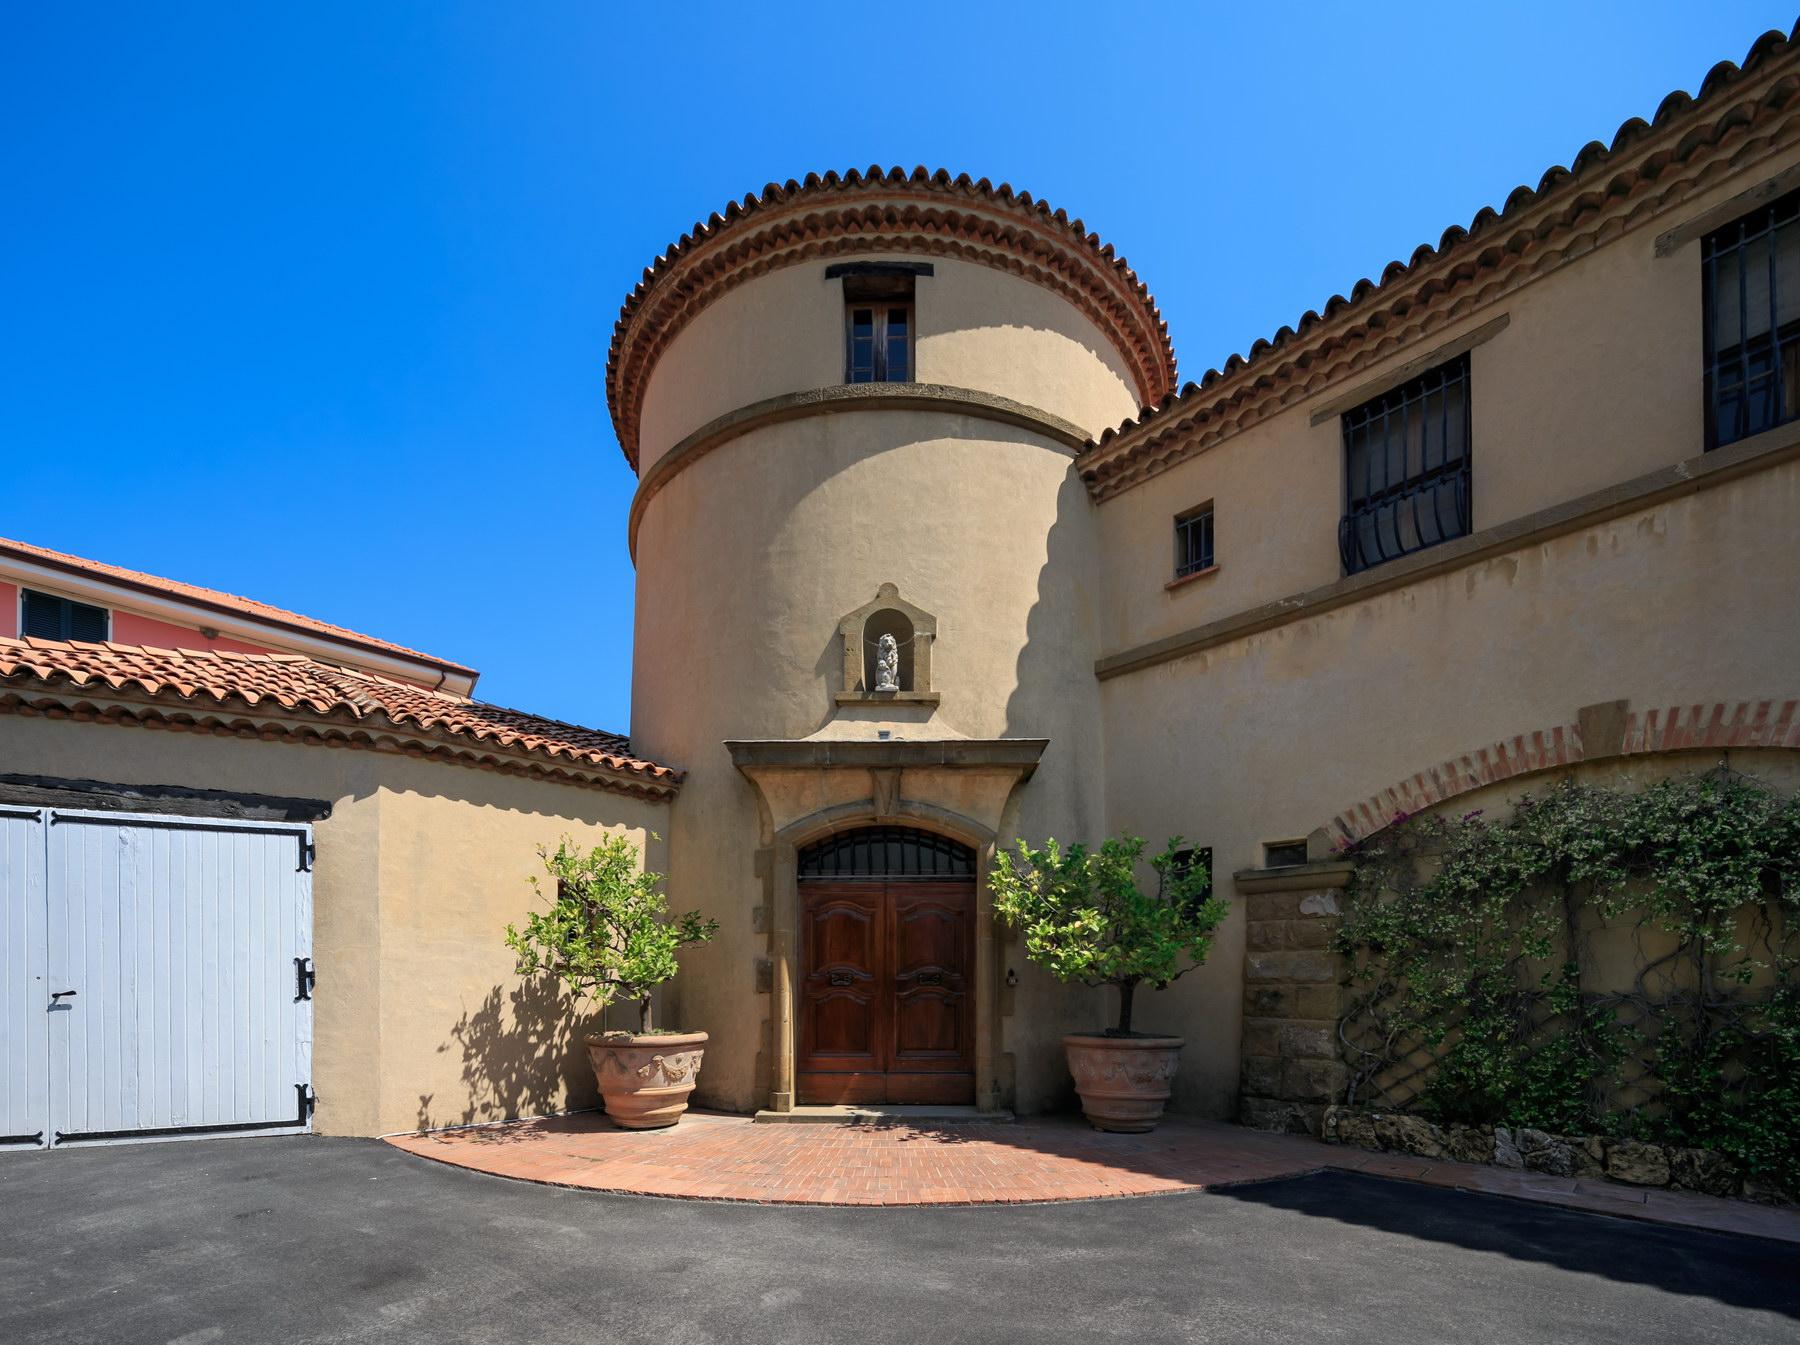 Villa in Vendita a Lerici: 5 locali, 620 mq - Foto 5